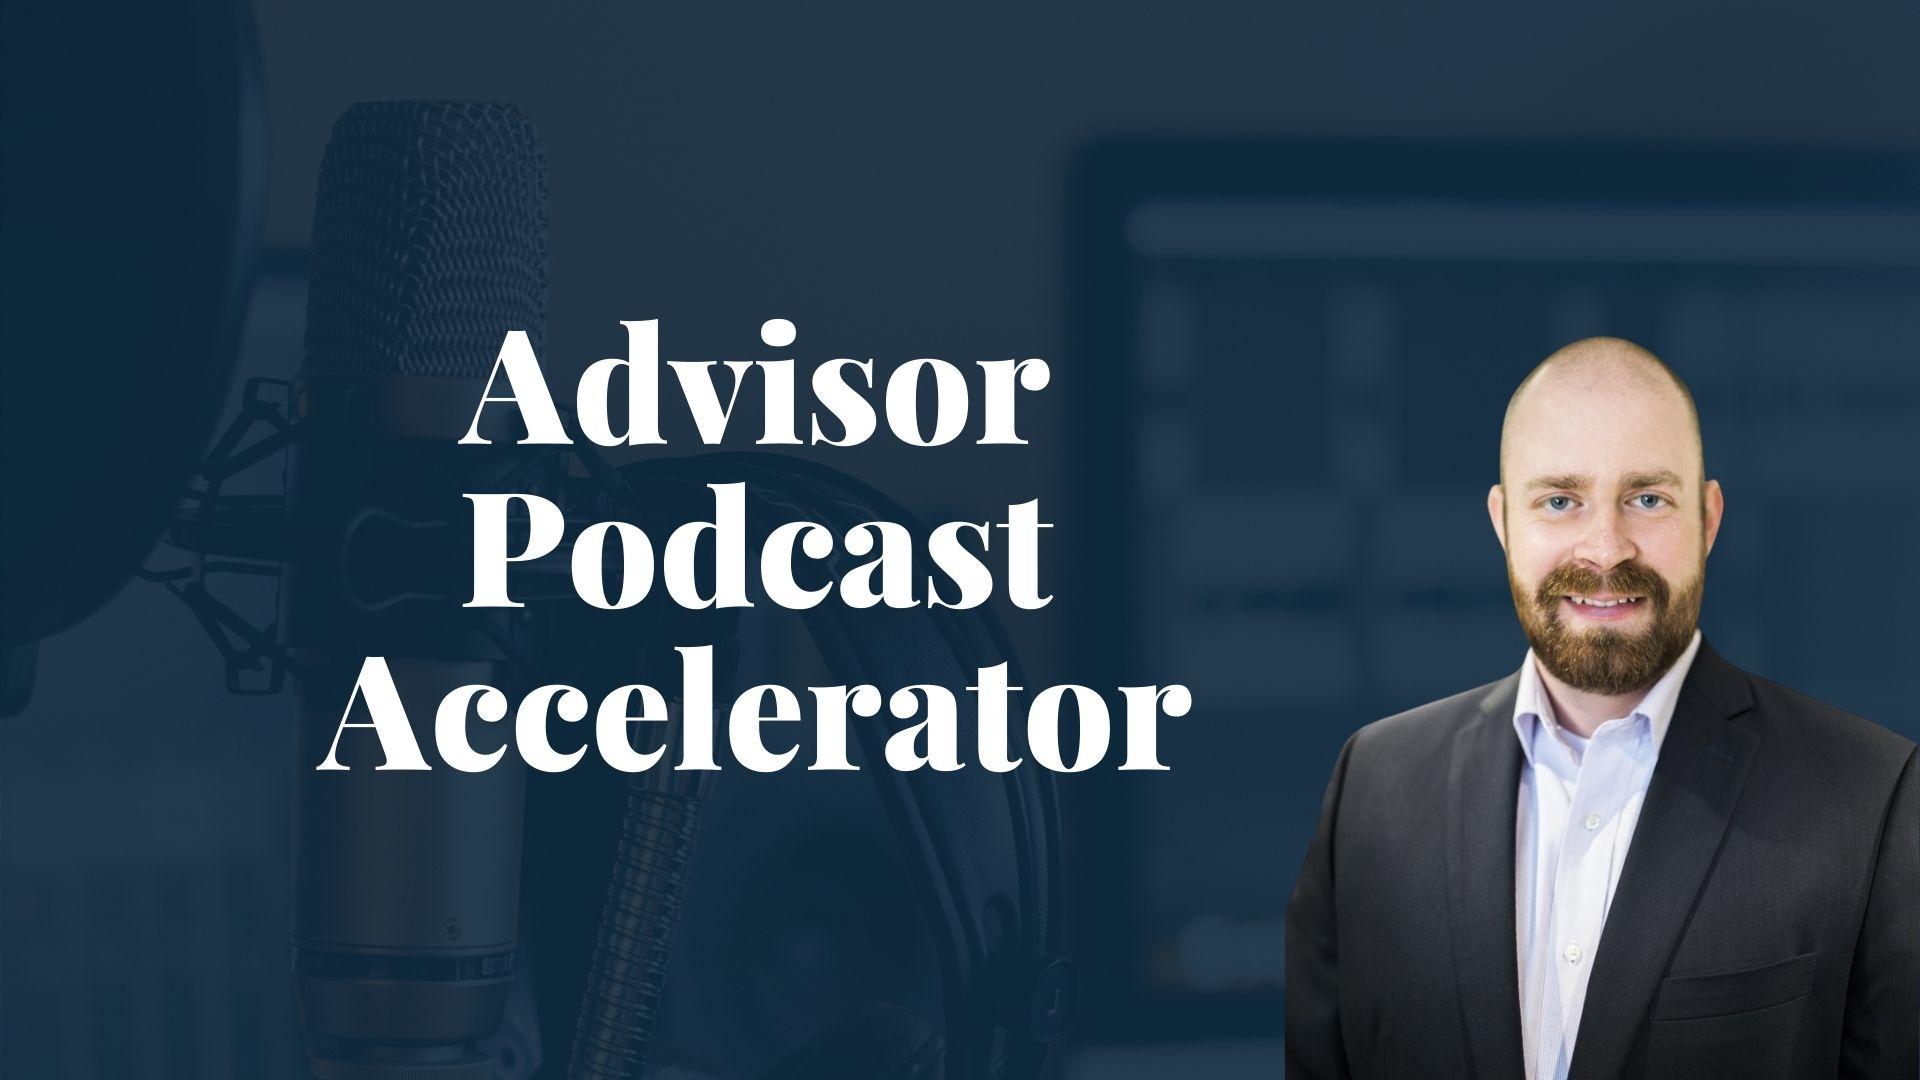 Advisor Podcast Accelerator